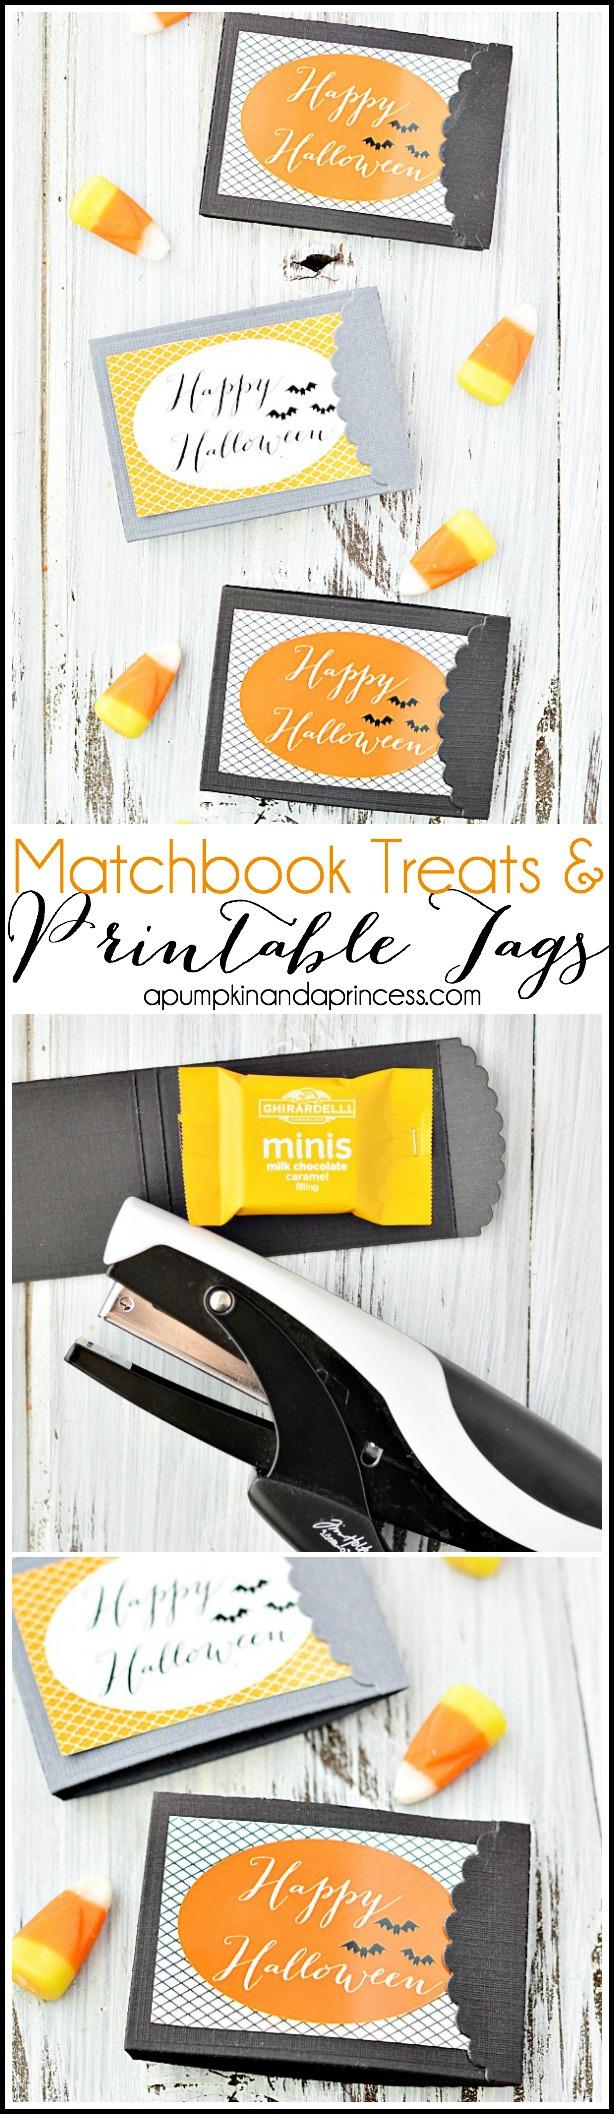 Matchbook-Treats-Printable-Halloween-Tags - A Pumpkin & a Princess